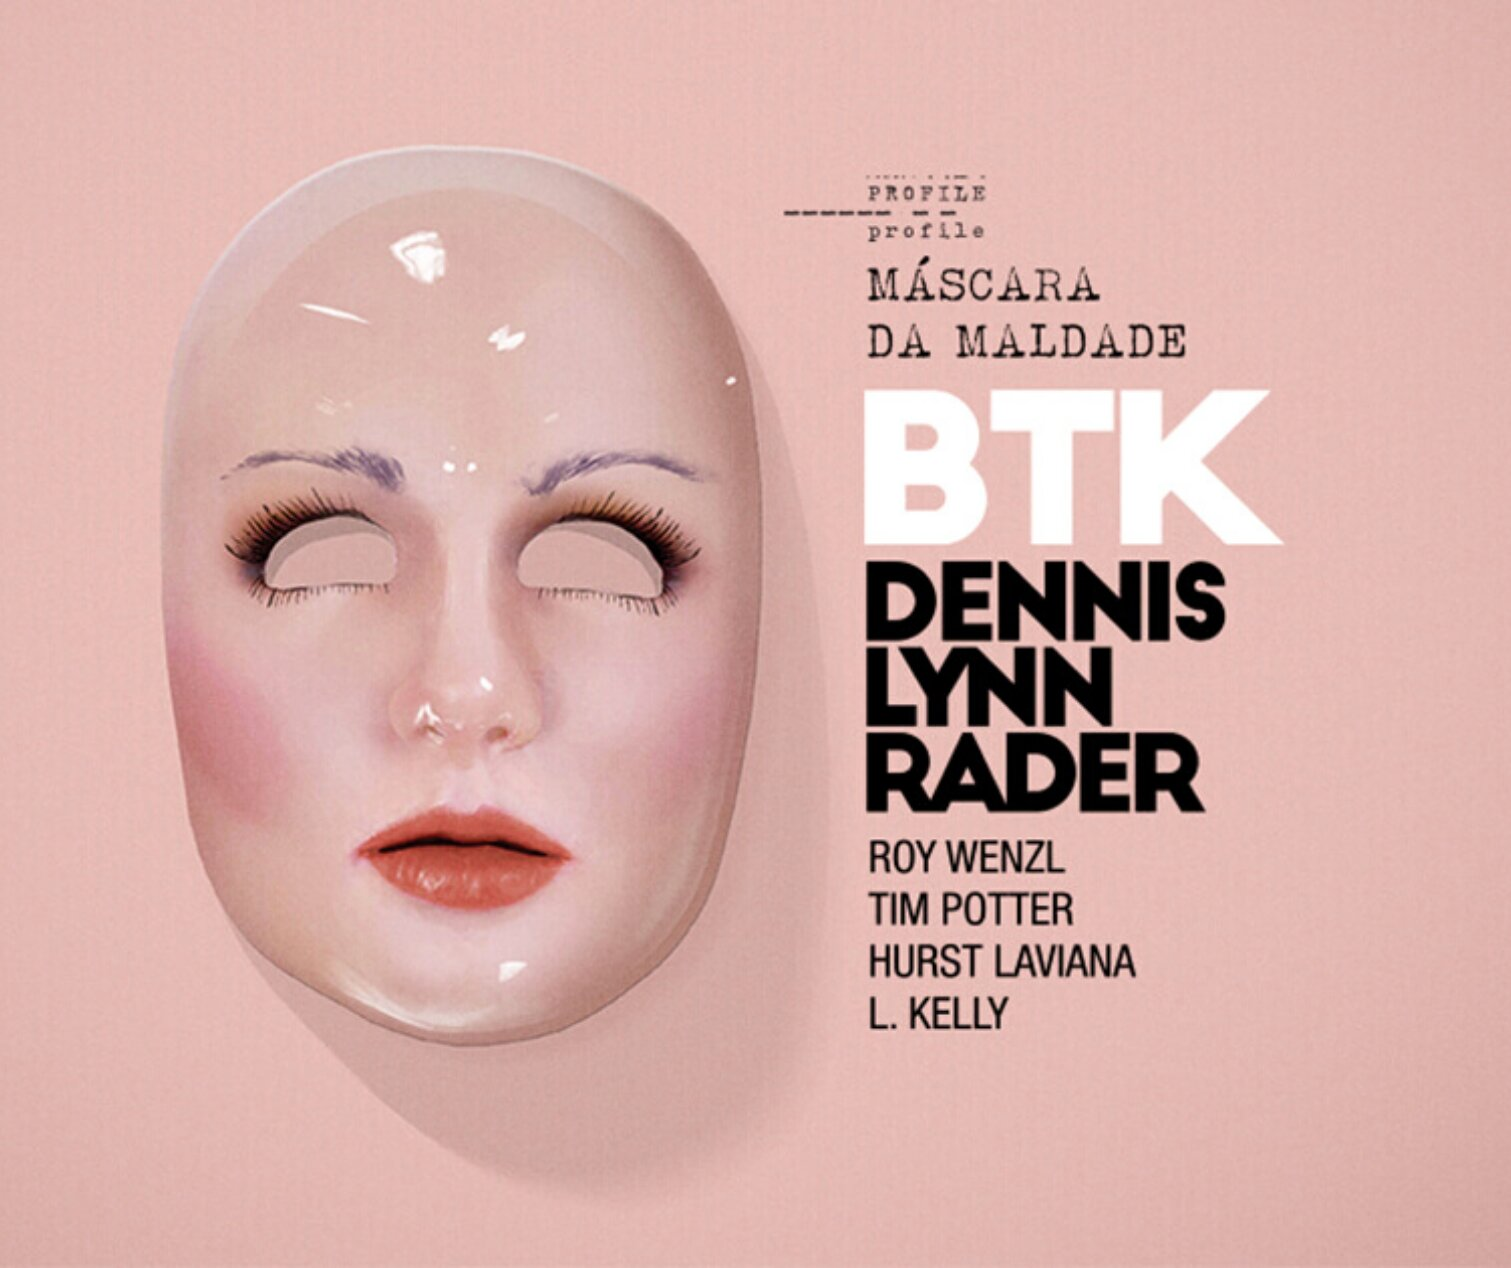 Resenha: BTK Profile, Máscara da Maldade, de Roy Wenzl, Tim Potter, L. Kelly e Hurst Laviana